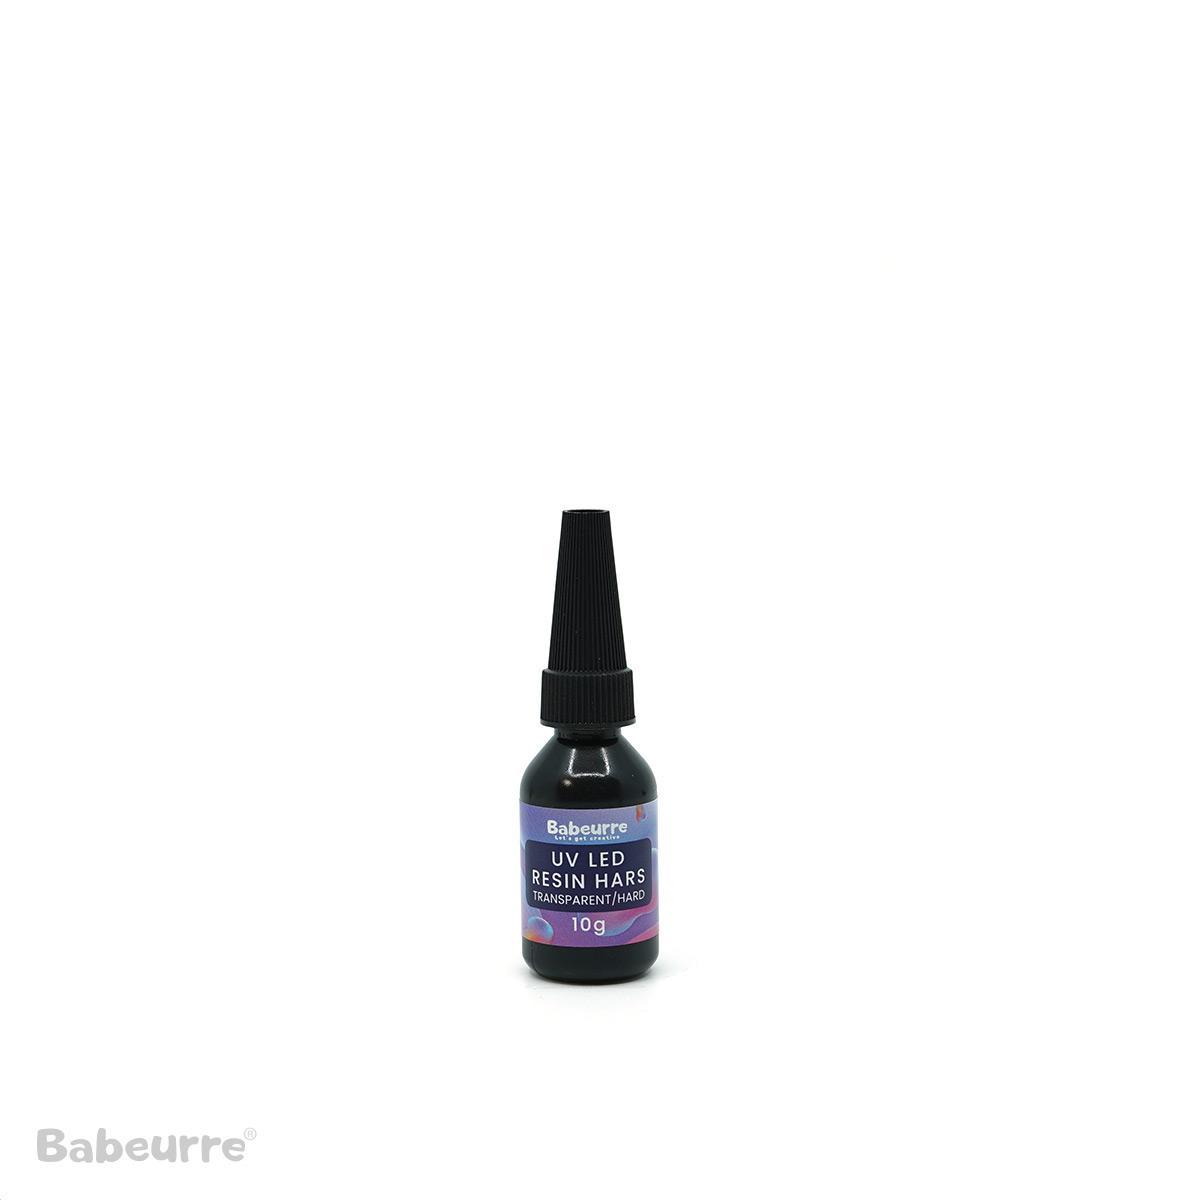 UV Led Resin Hars Babeurre Hard Huismerk Transparant 10gr